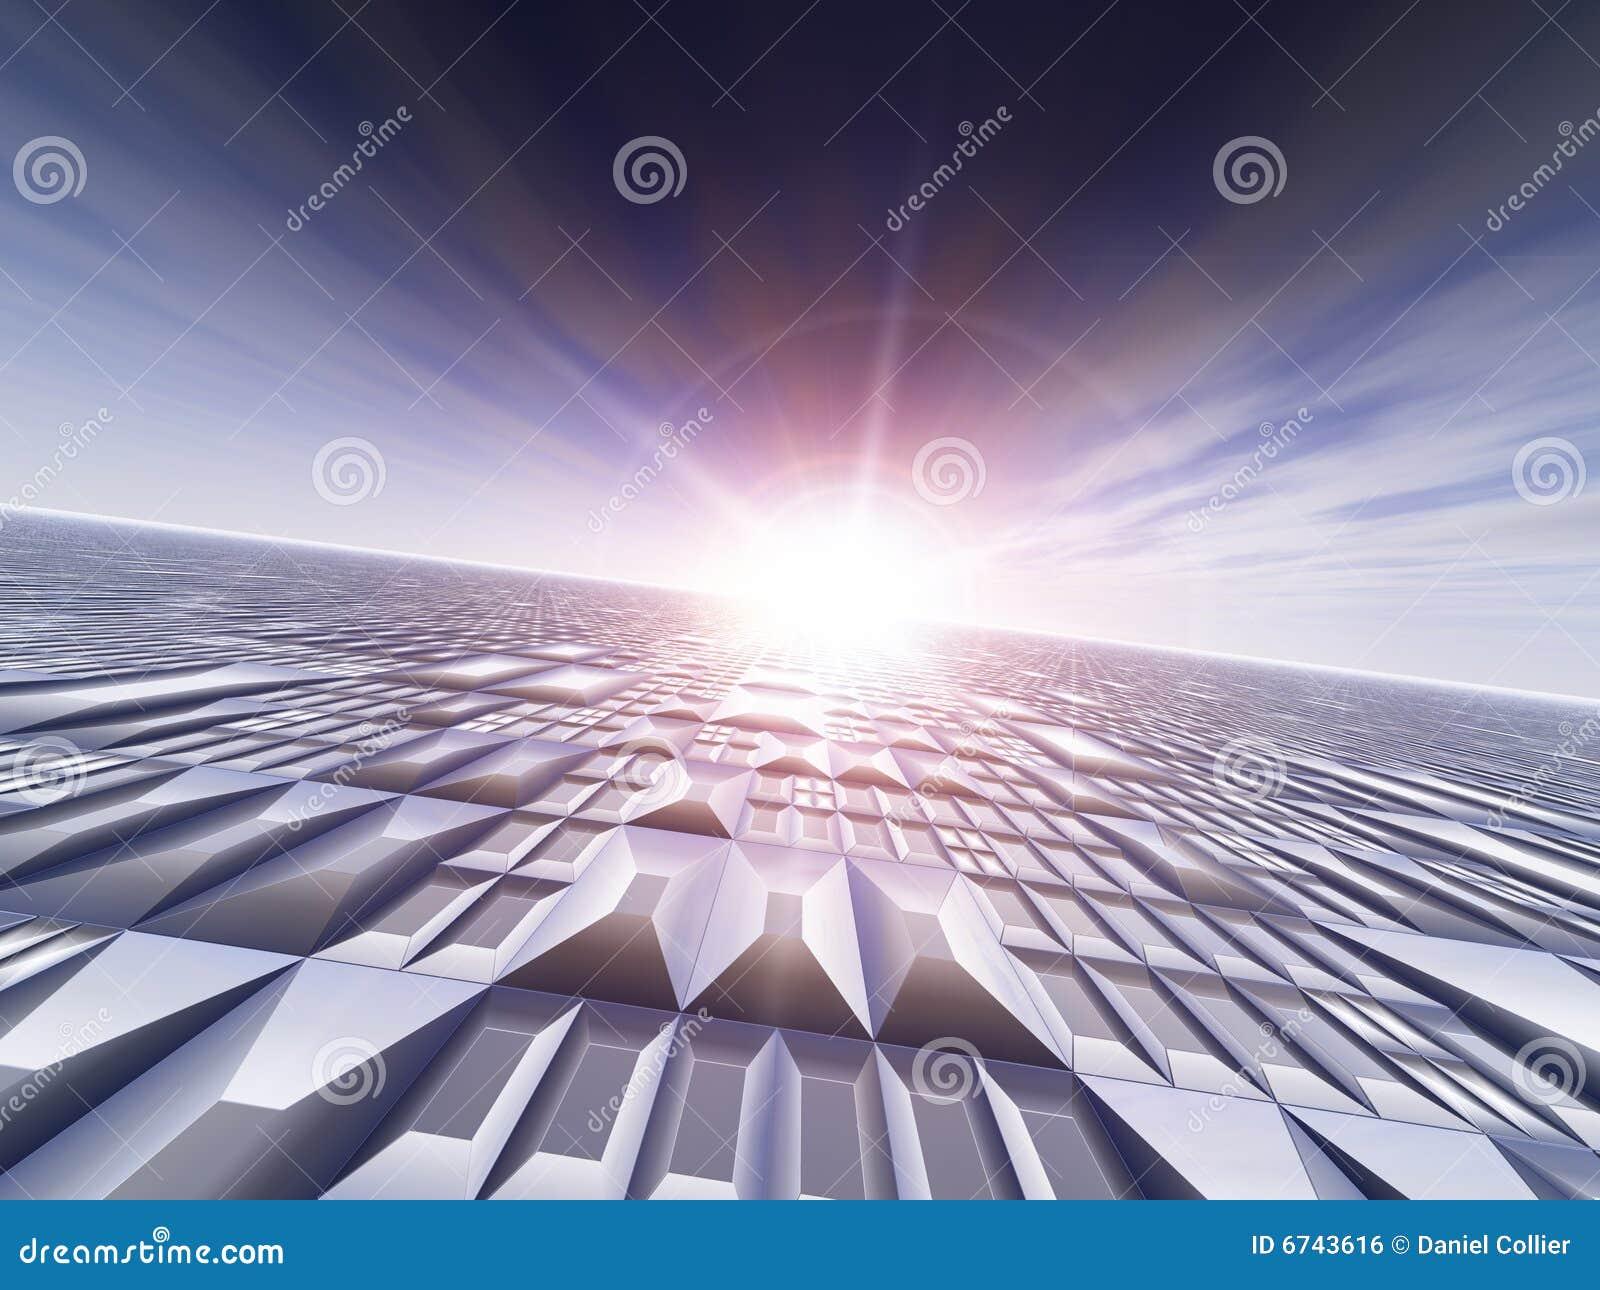 Grid Technology Background Royalty Free Stock Image